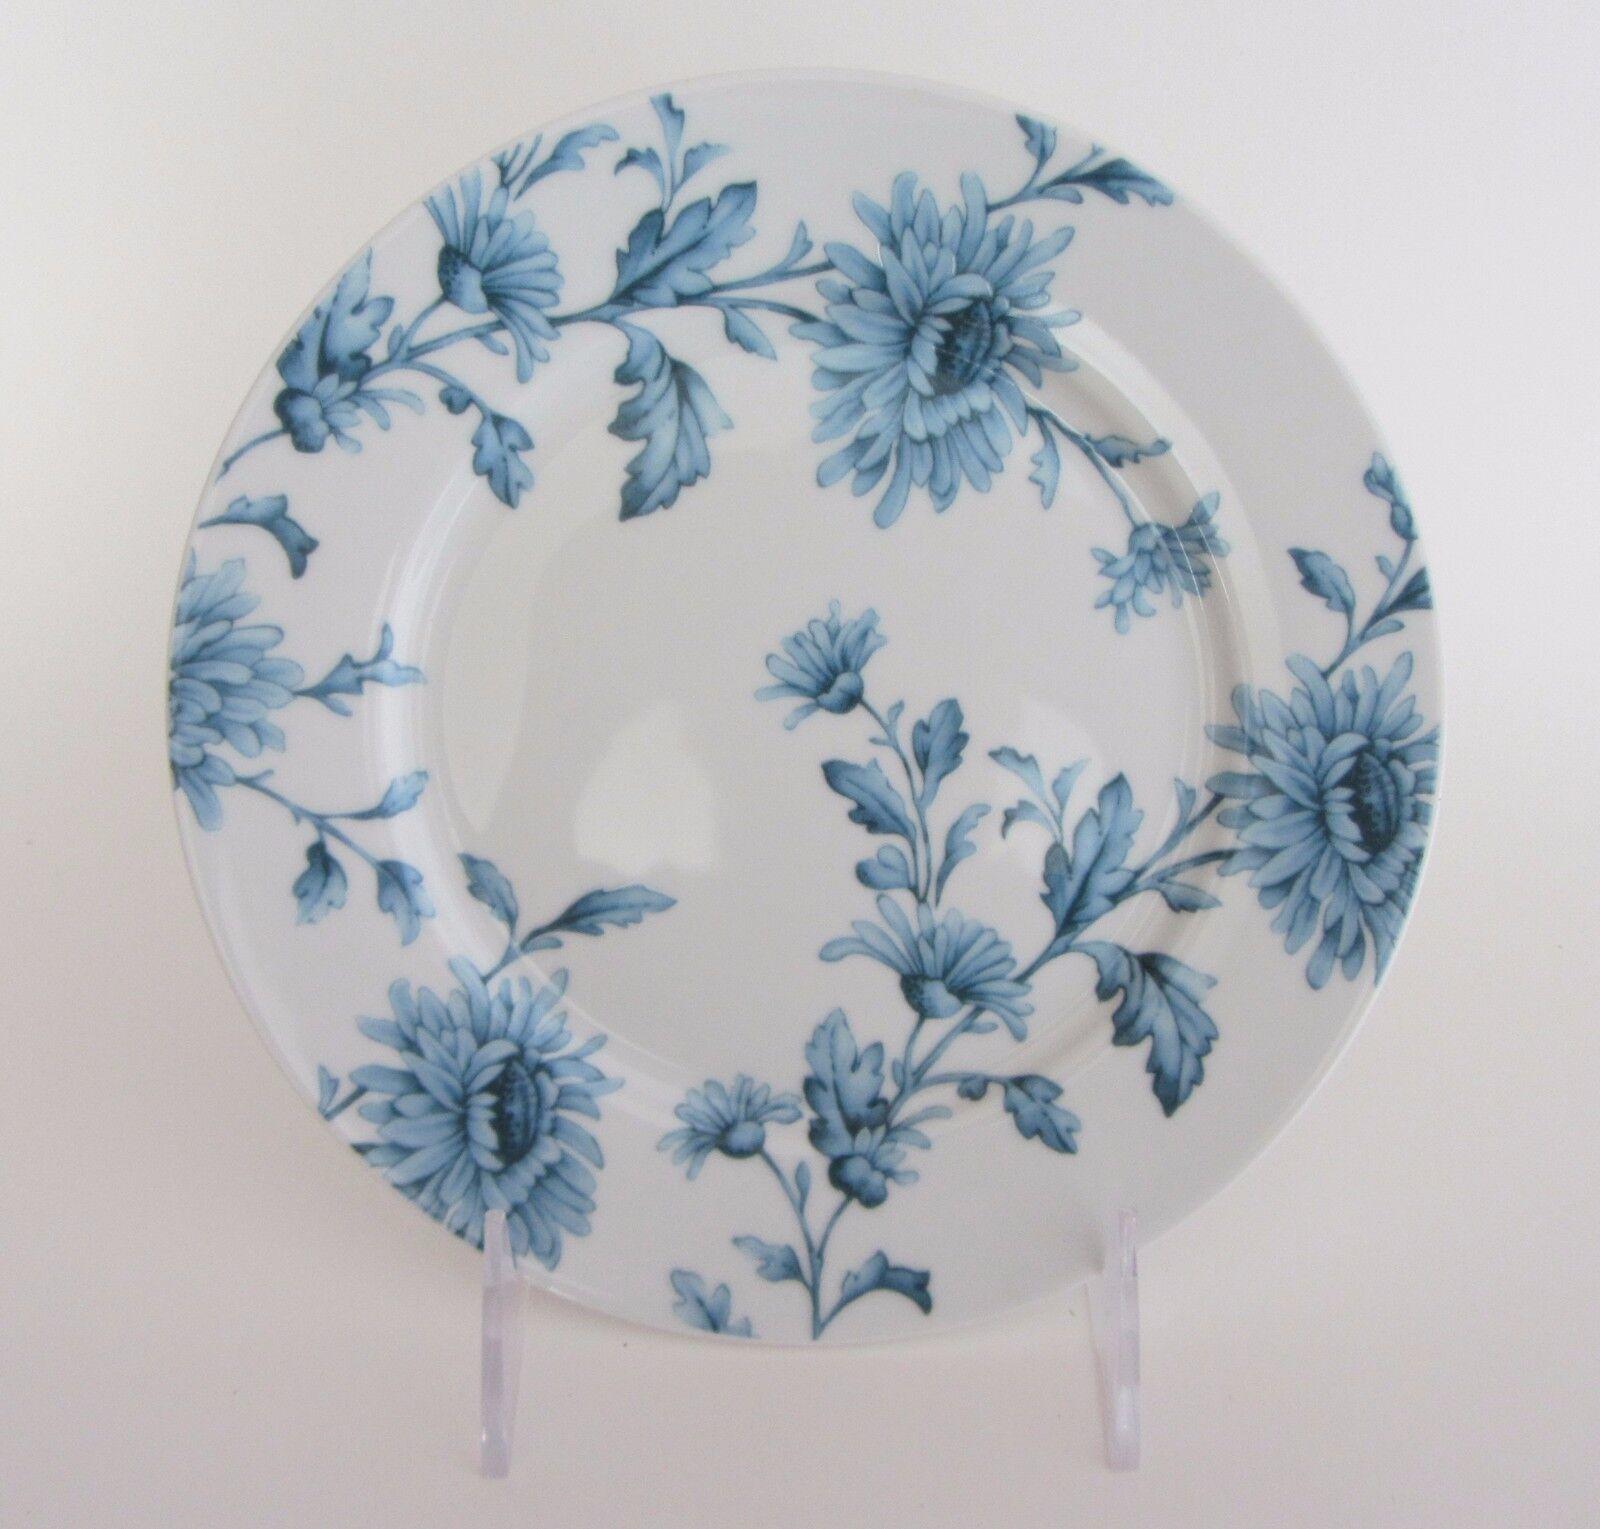 SPODE Home Vintage Denim 7.5  SALAD PLATE - Set of 4 NEW bluee Flowers on White